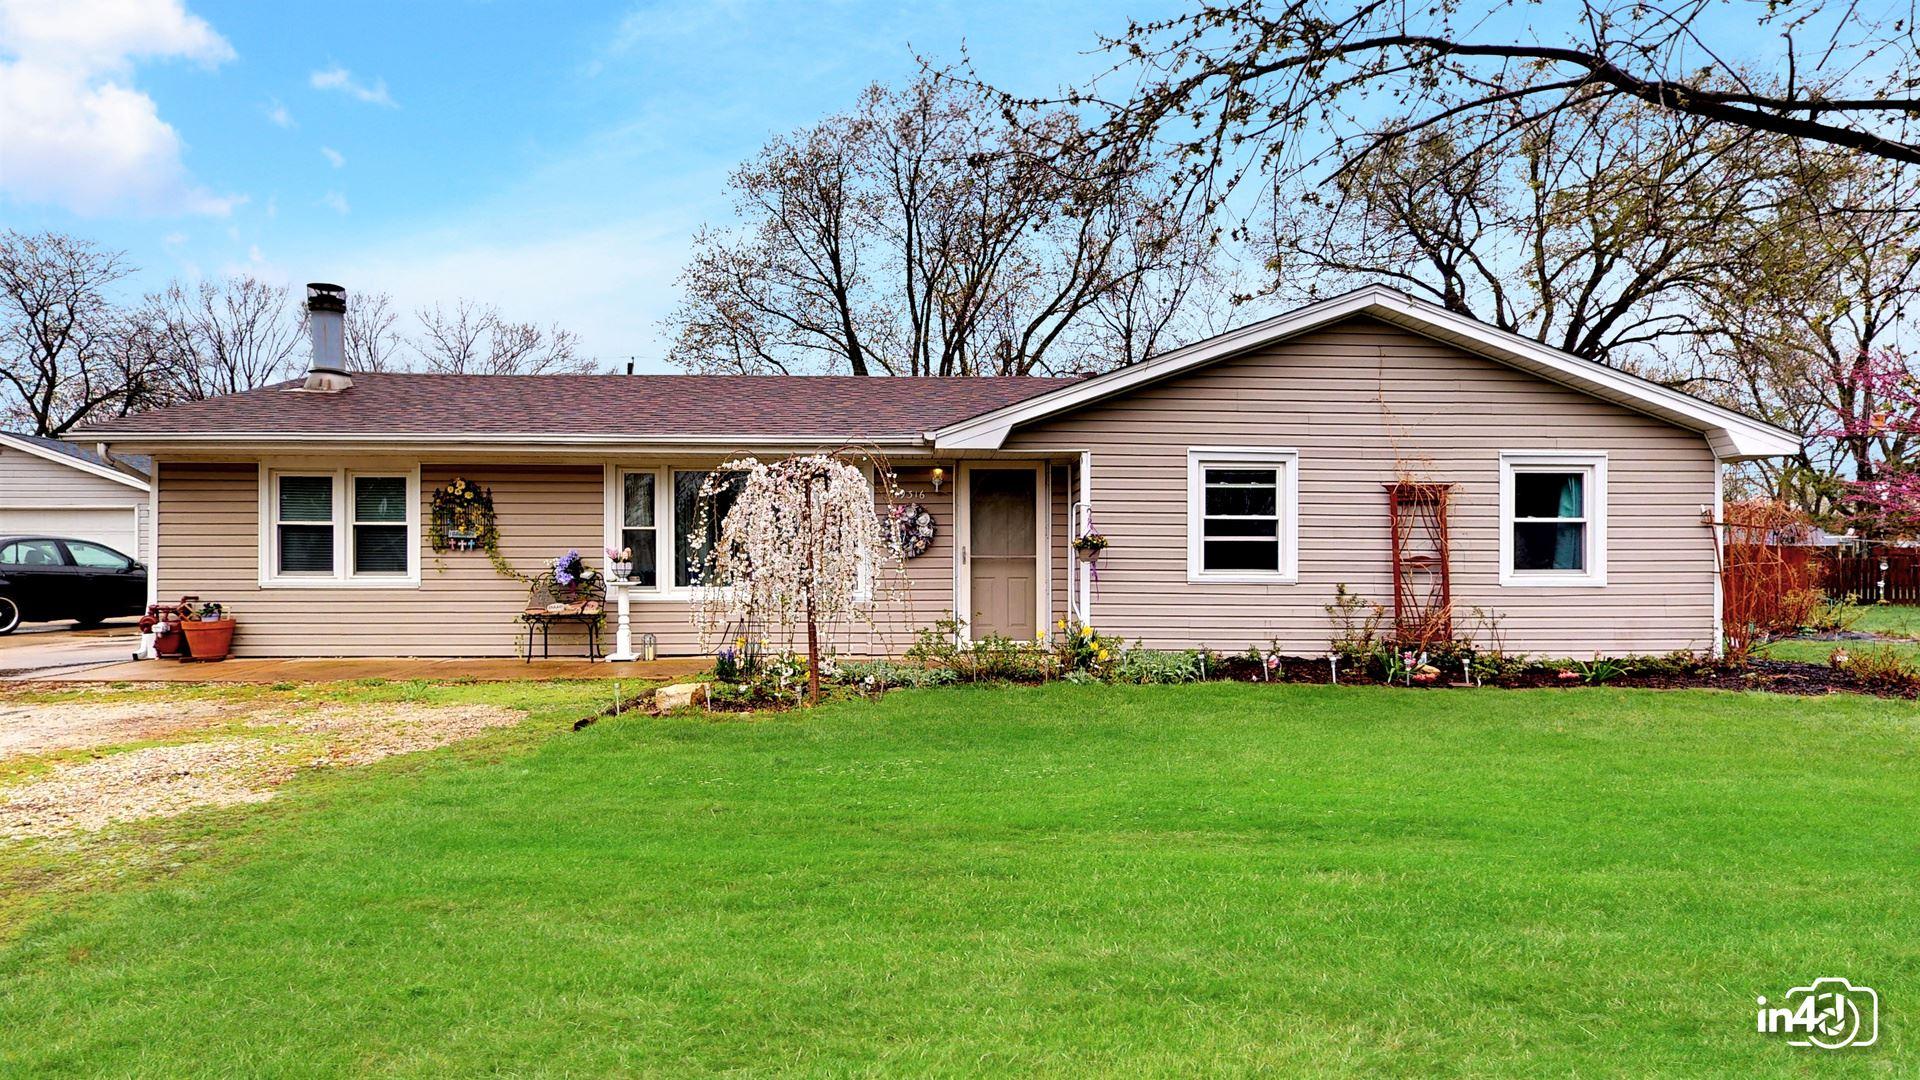 Photo of 19316 Jacquie Avenue, Romeoville, IL 60446 (MLS # 11047811)